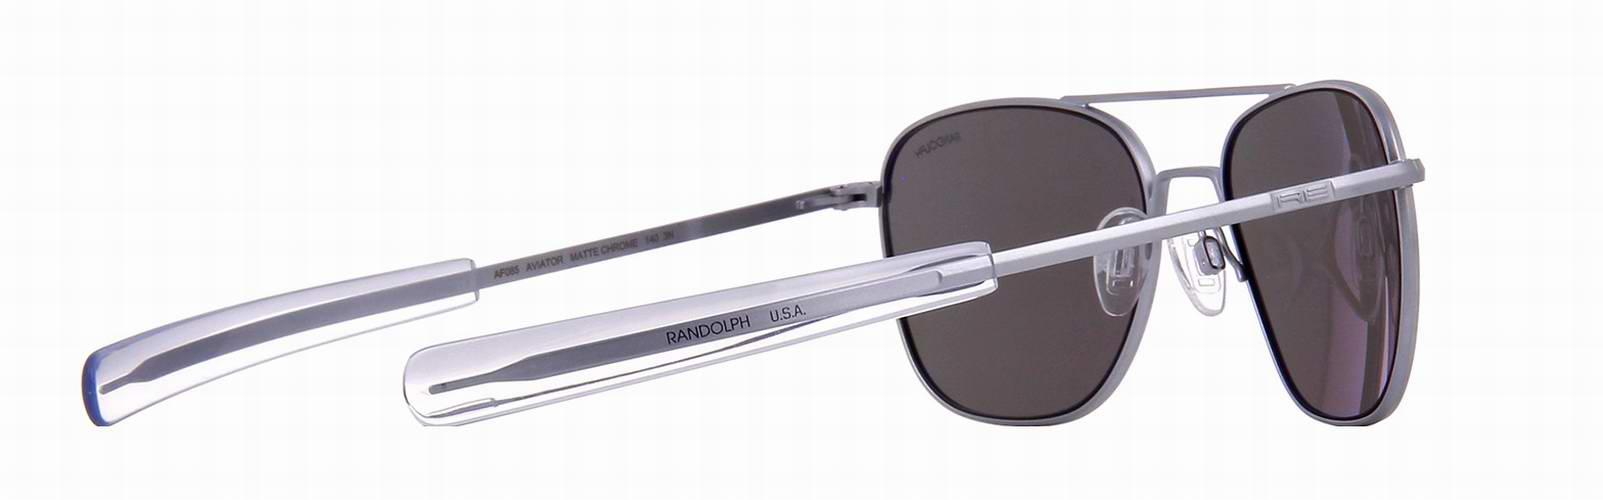 LUNETTES DE SOLEIL polarisé aviator monture gun métal  verre flash miroir Randolph